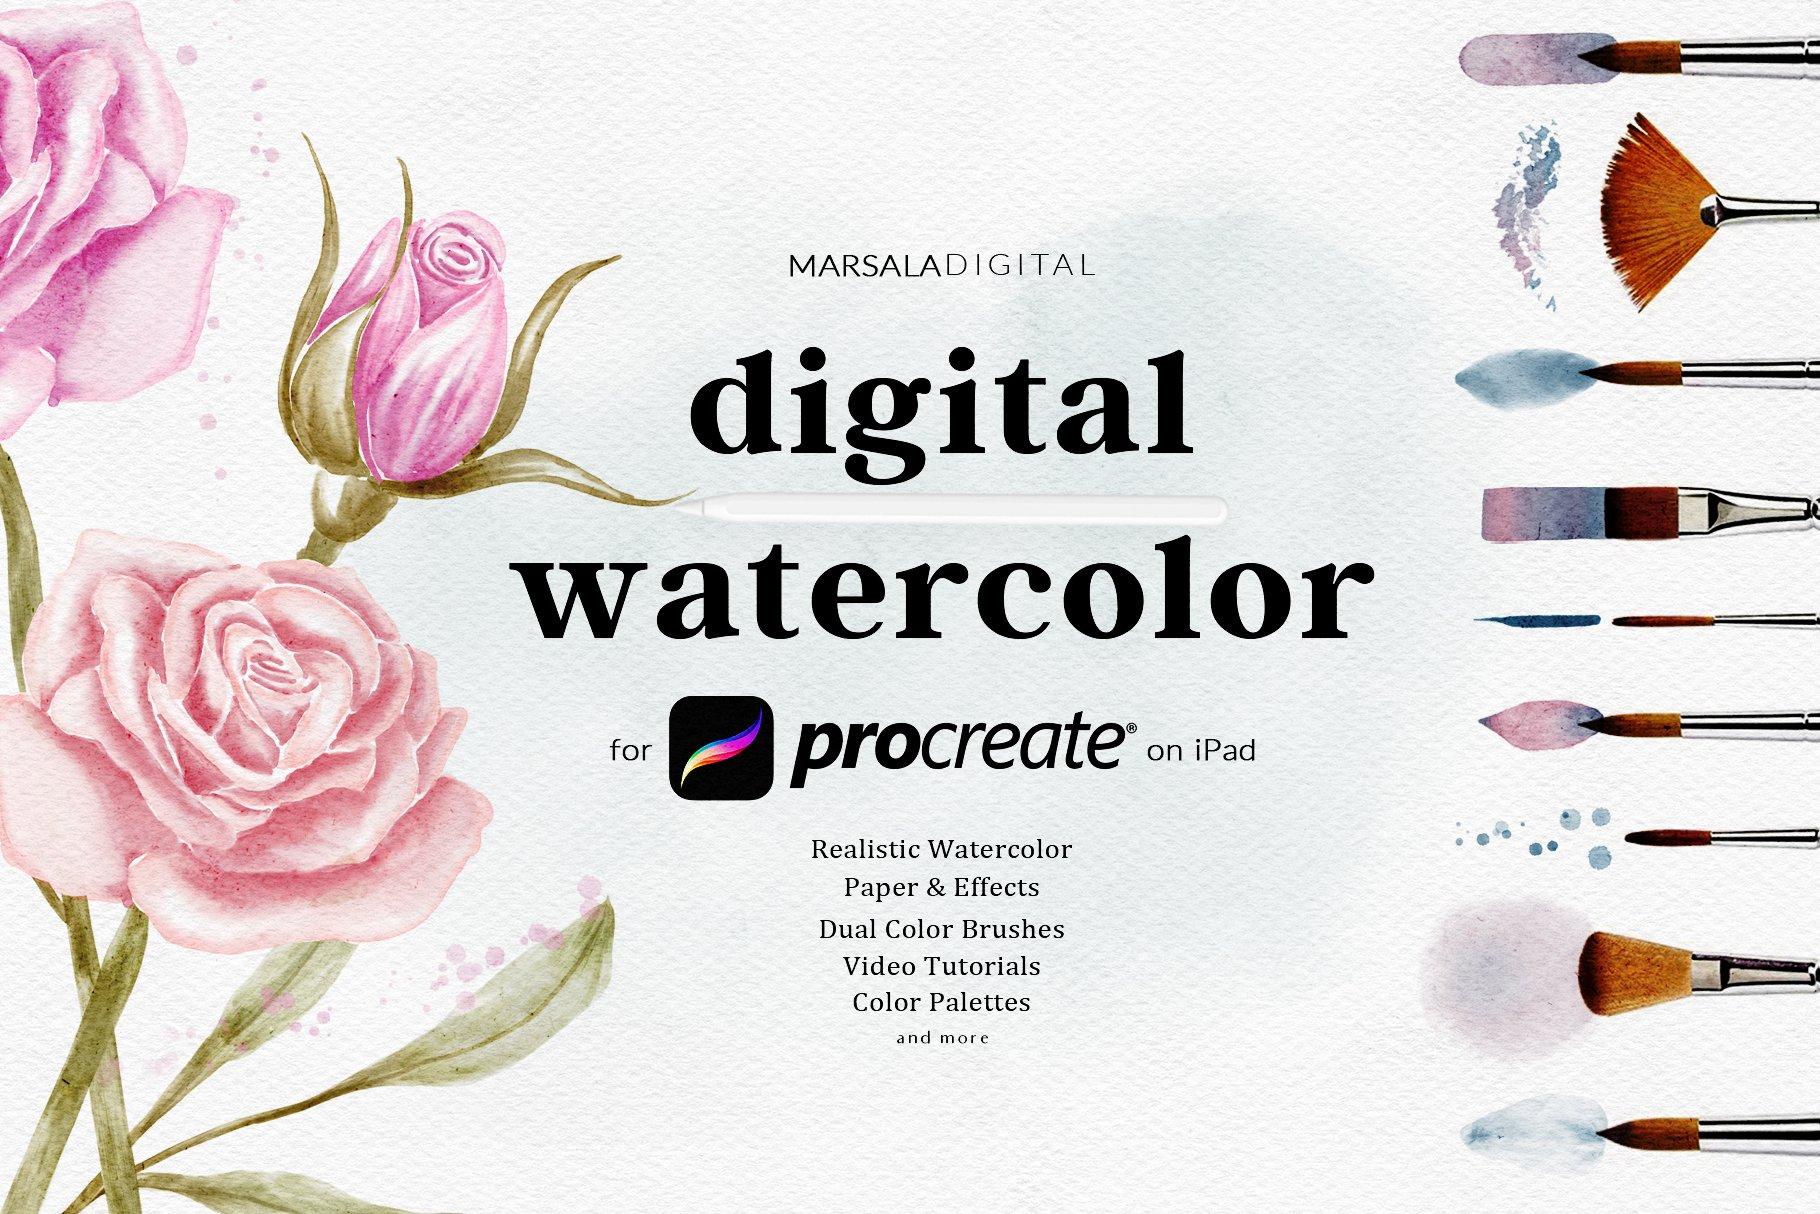 Peonies Procreate Color Palette  Spring Flower Colors  Procreate Floral Palette  Watercolor Flowers  iPad Art  Digital Swatches